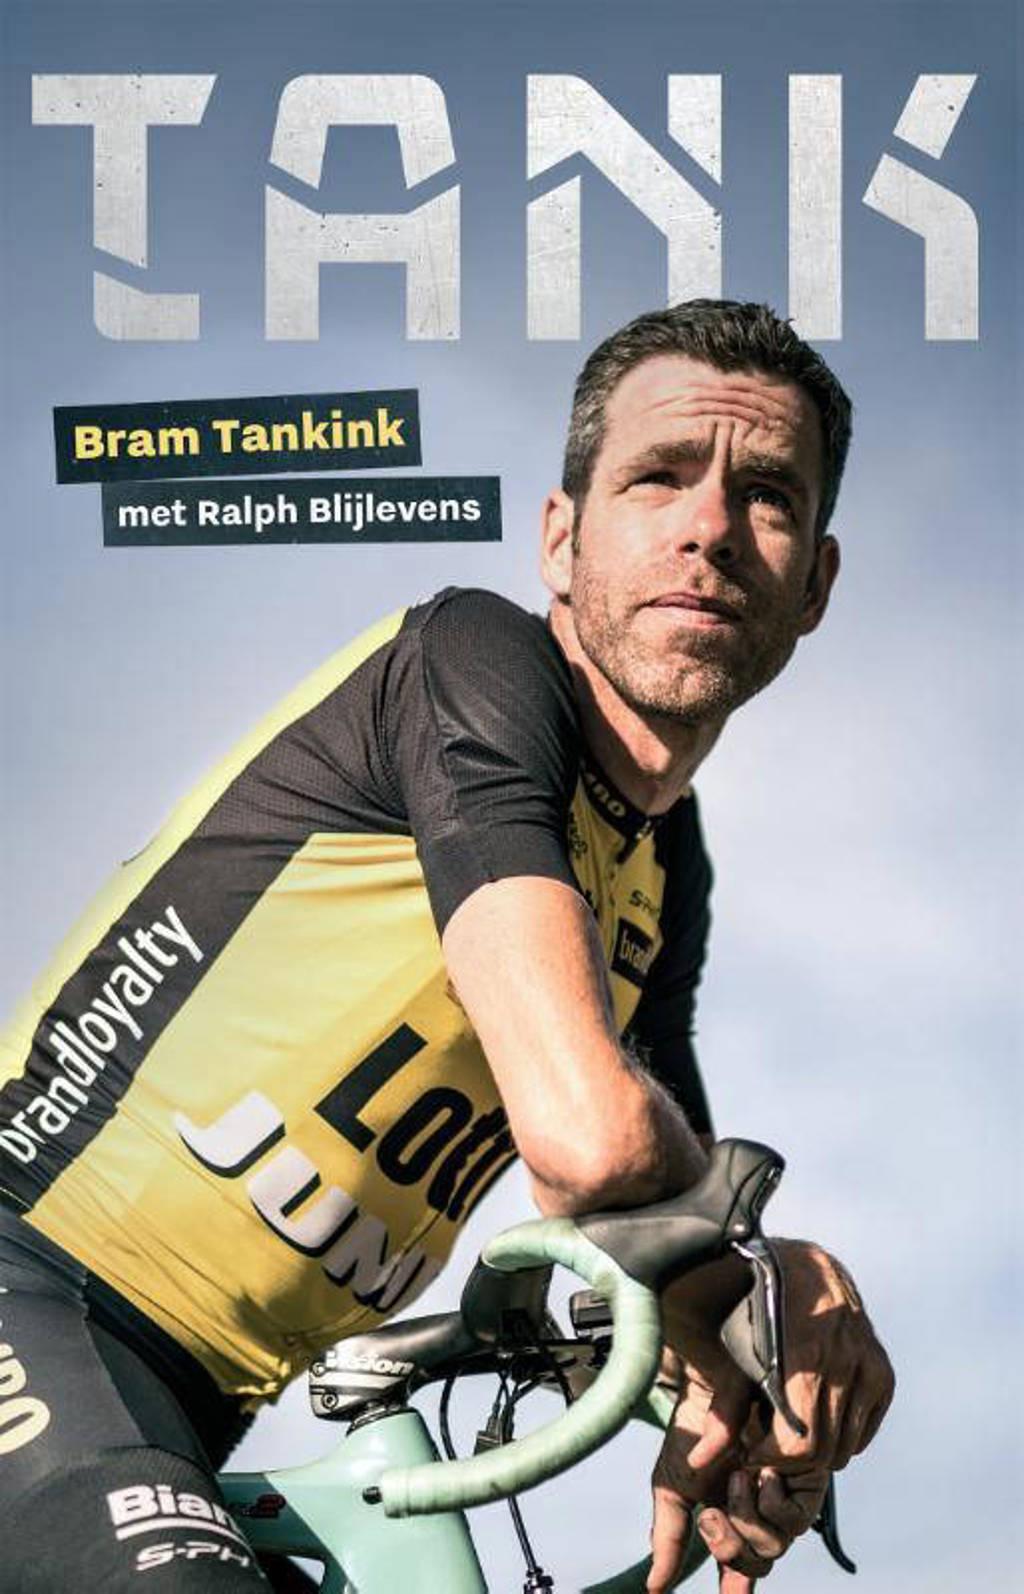 Tank - Bram Tankink en Ralph Blijlevens